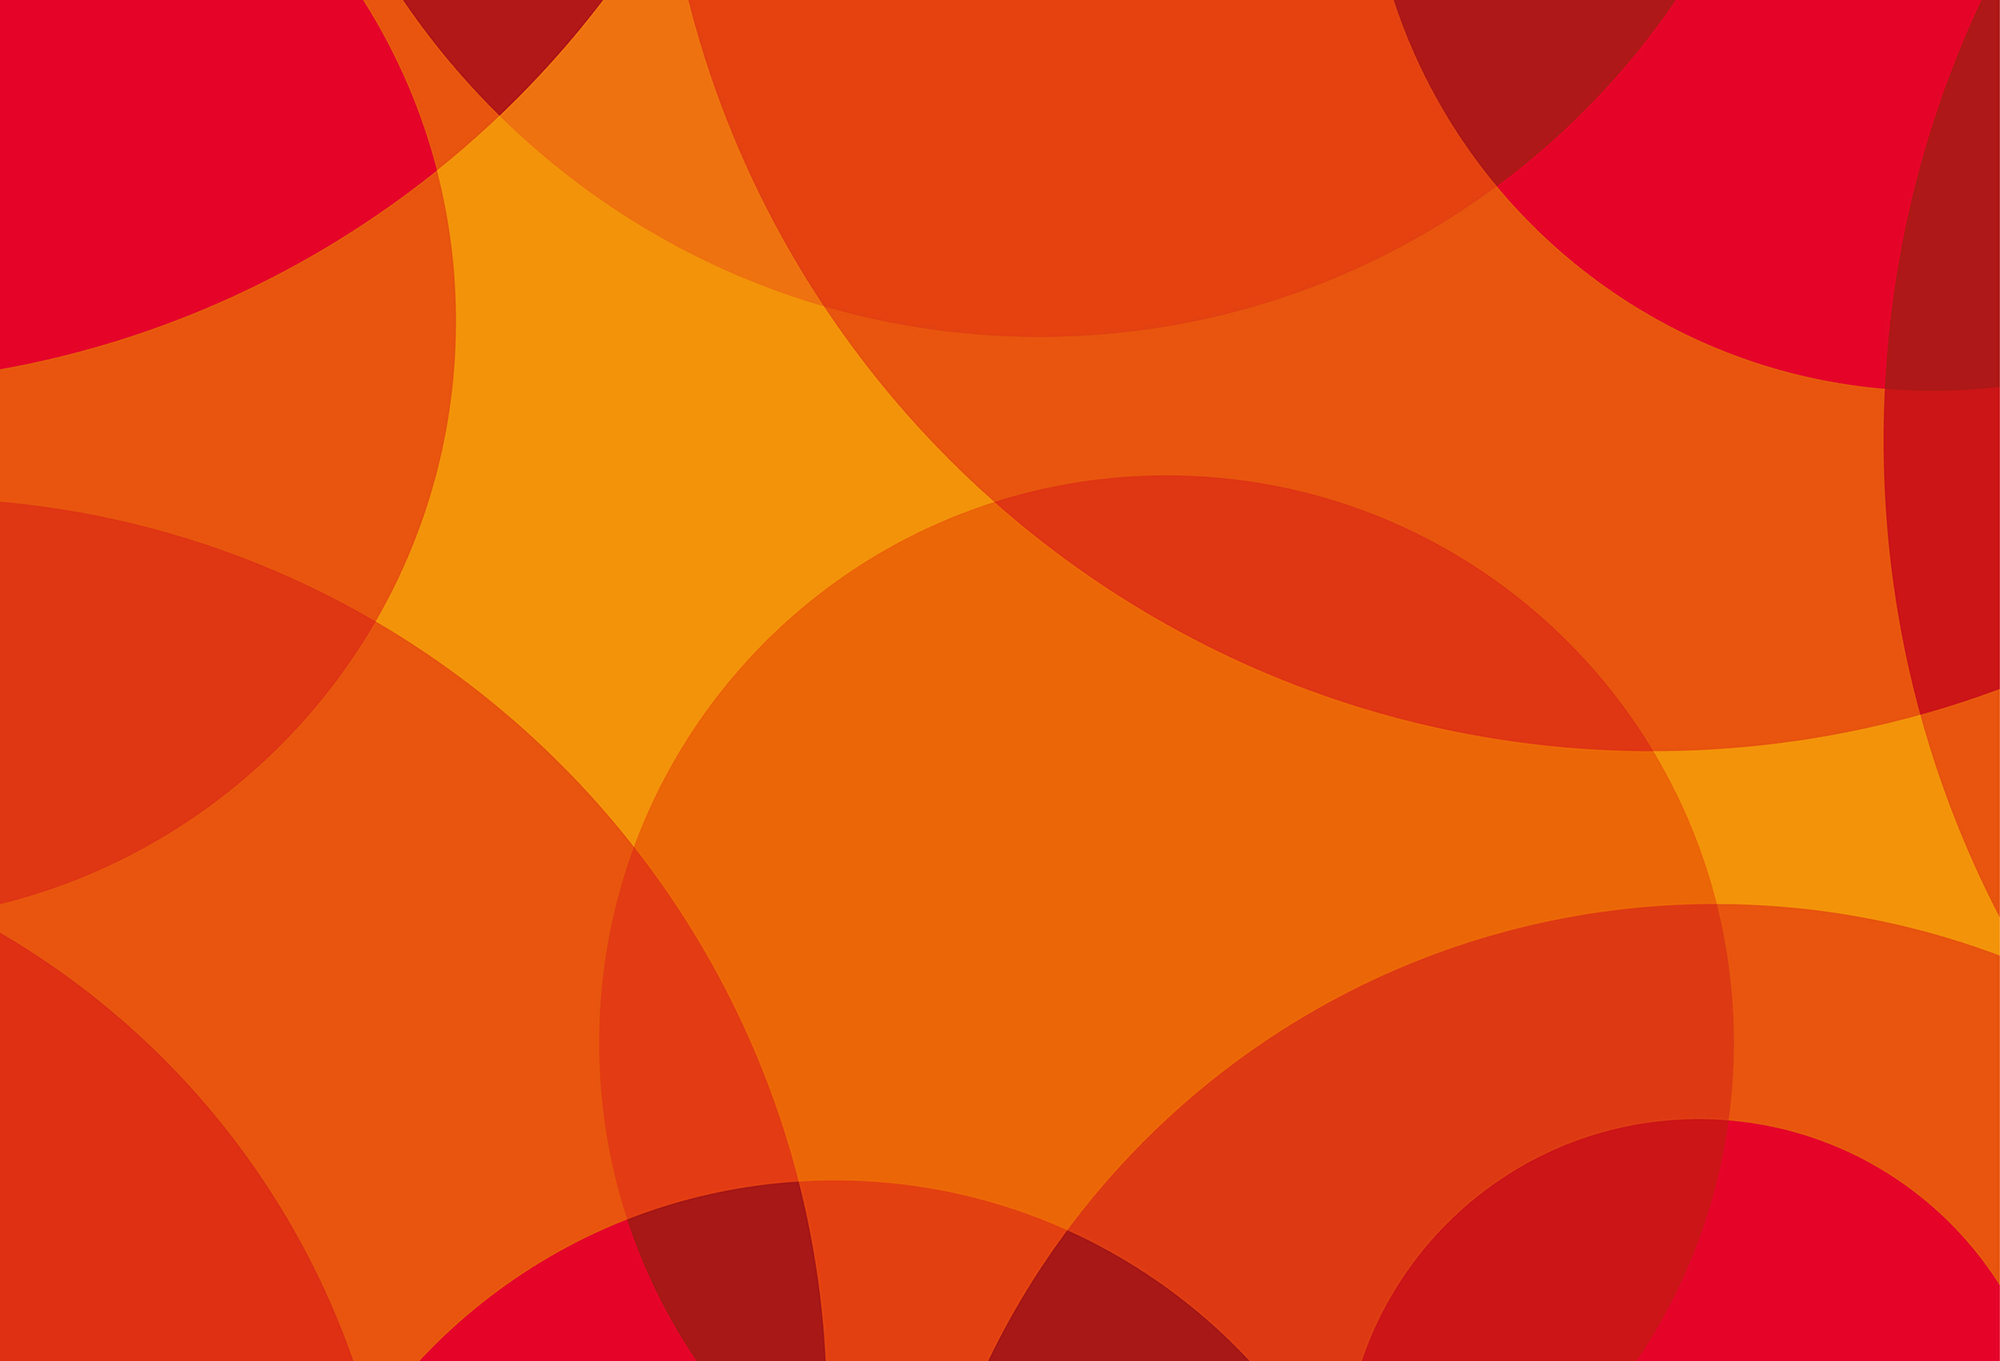 fond_orange-sommetvirtuelduclimat